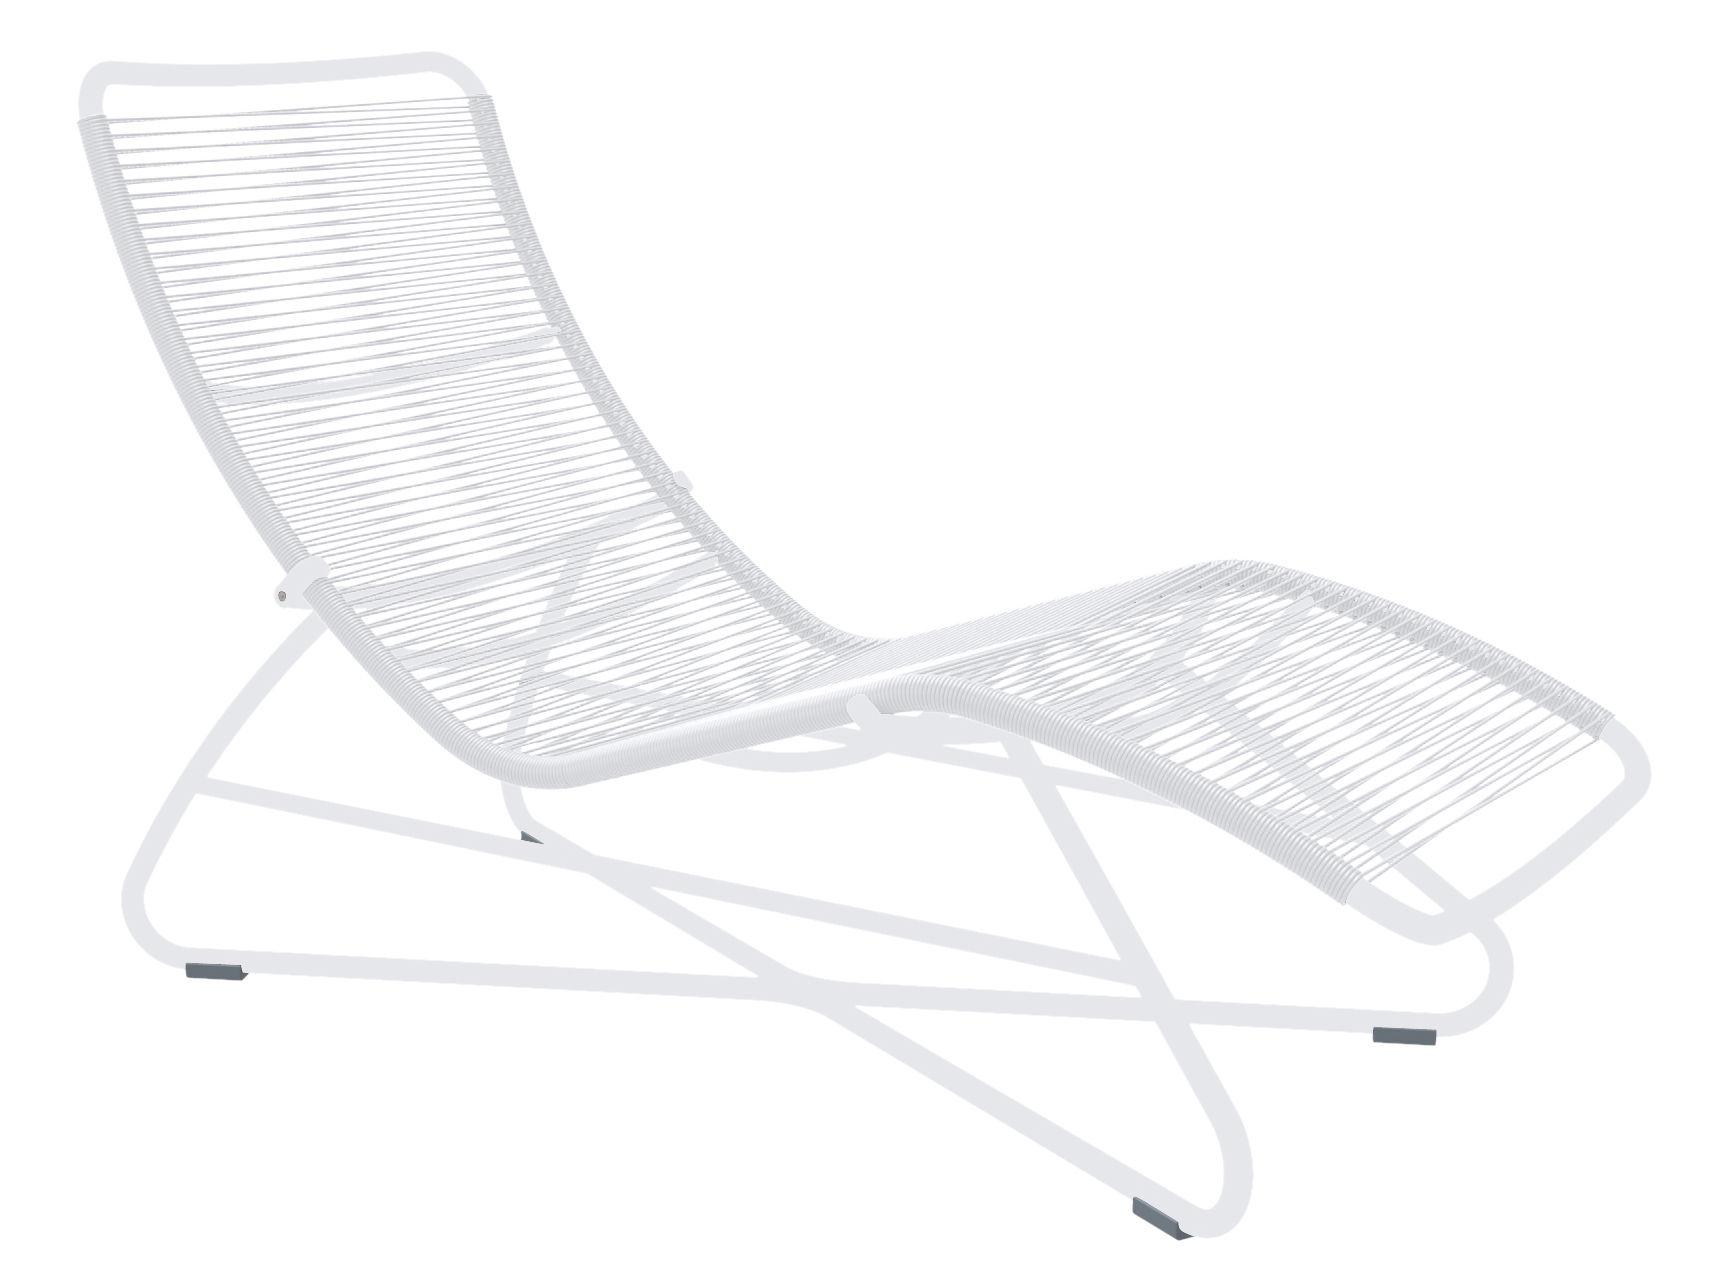 Chaise longue saint tropez blanc structure blanche fermob for Chaises longues blanches